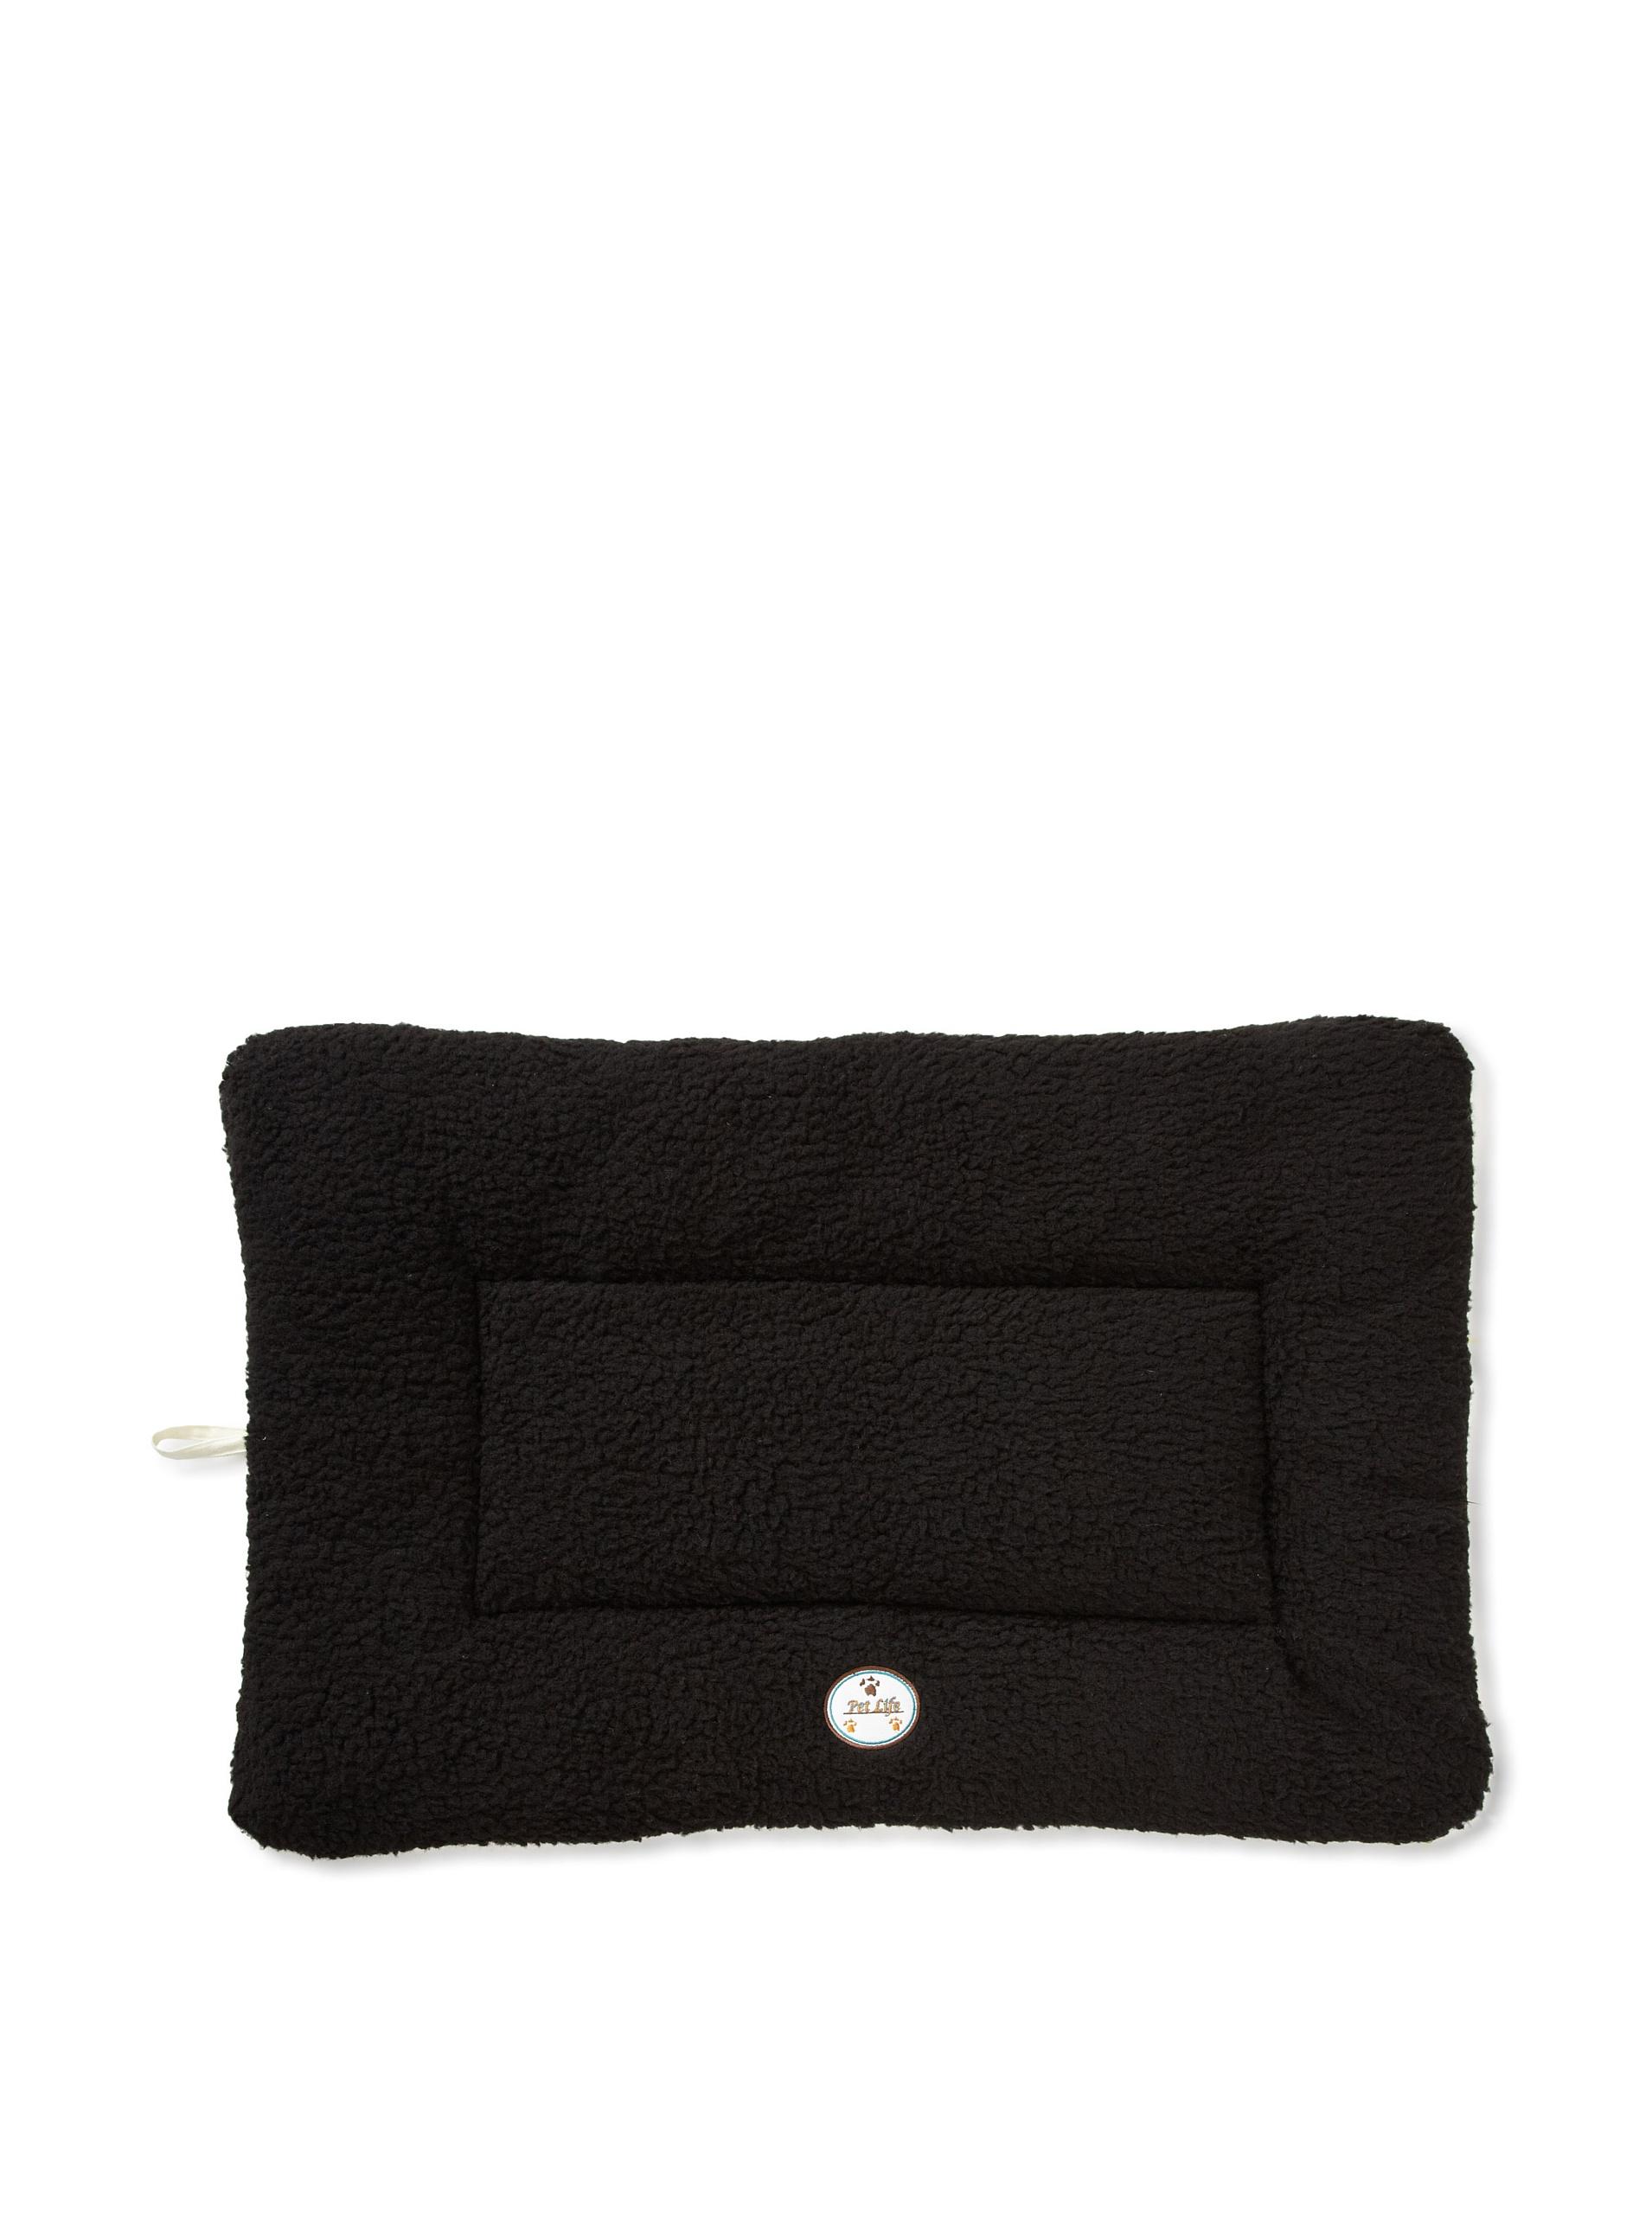 Pet Life Eco-Paw Reversible Pet Bed (Black/White)